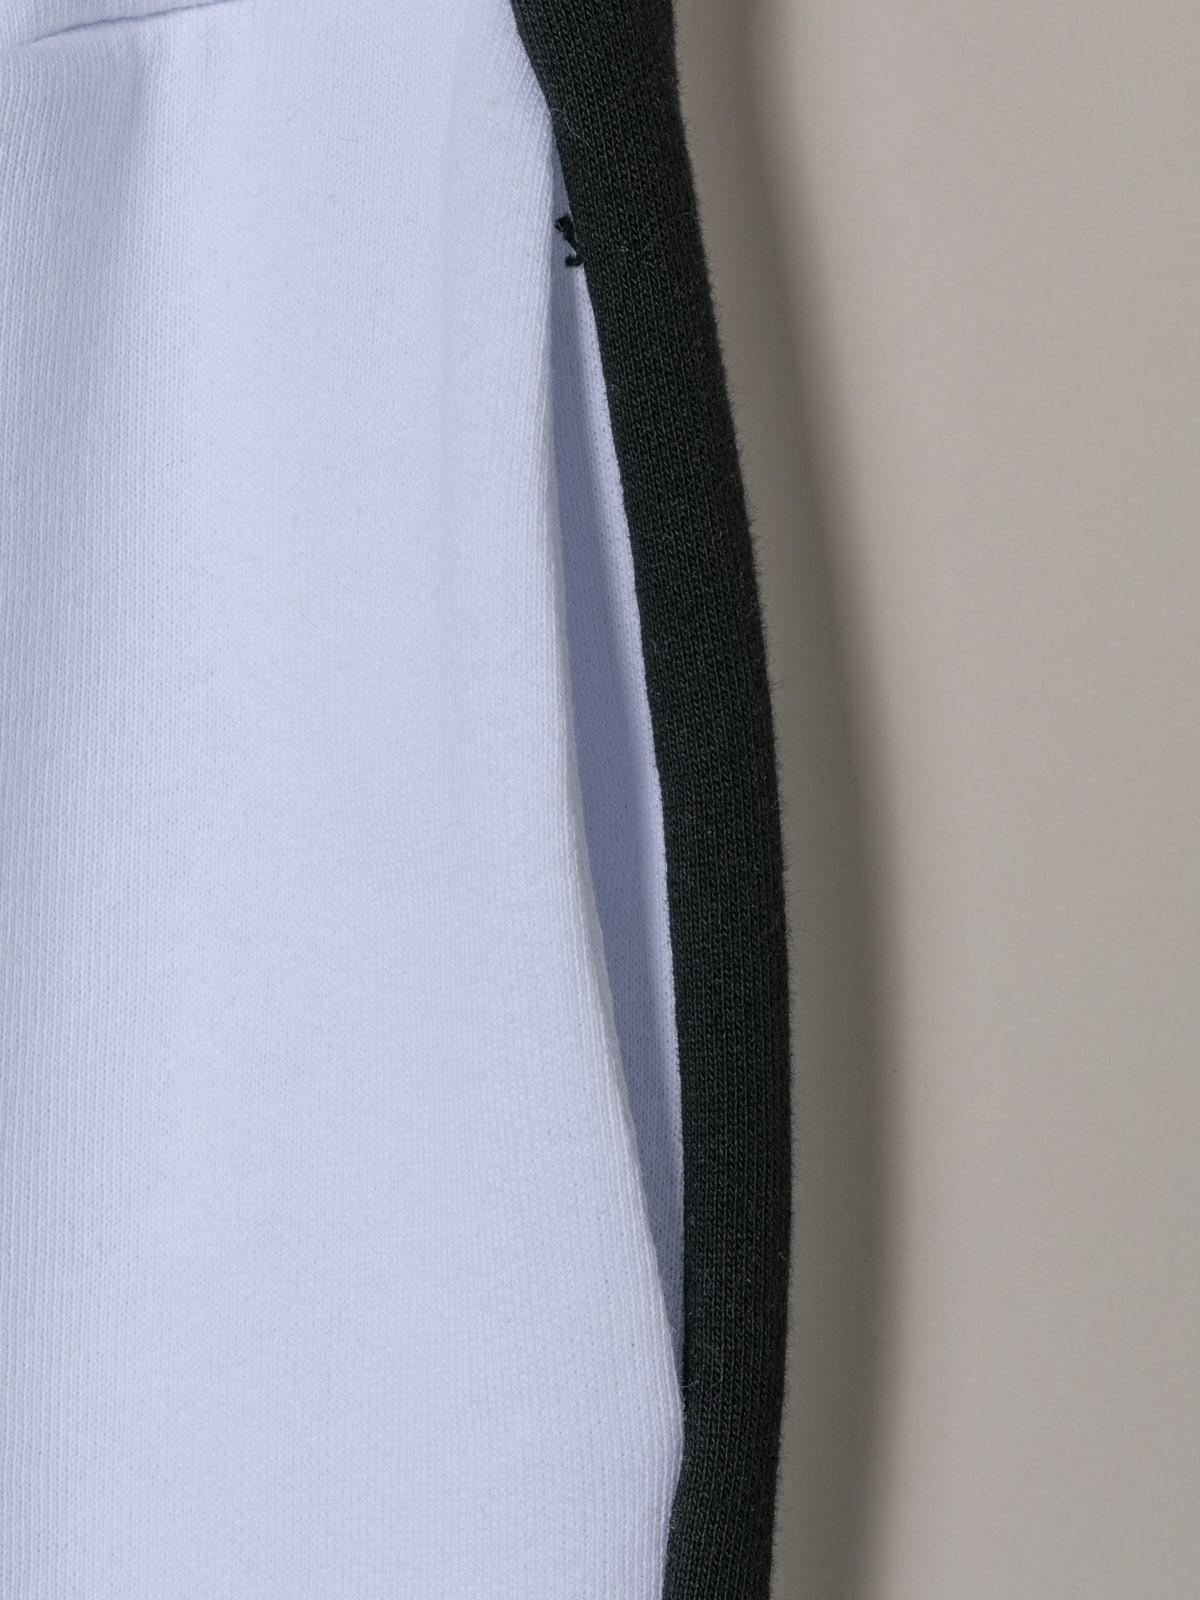 Pantalón sport mujer raya Blanco